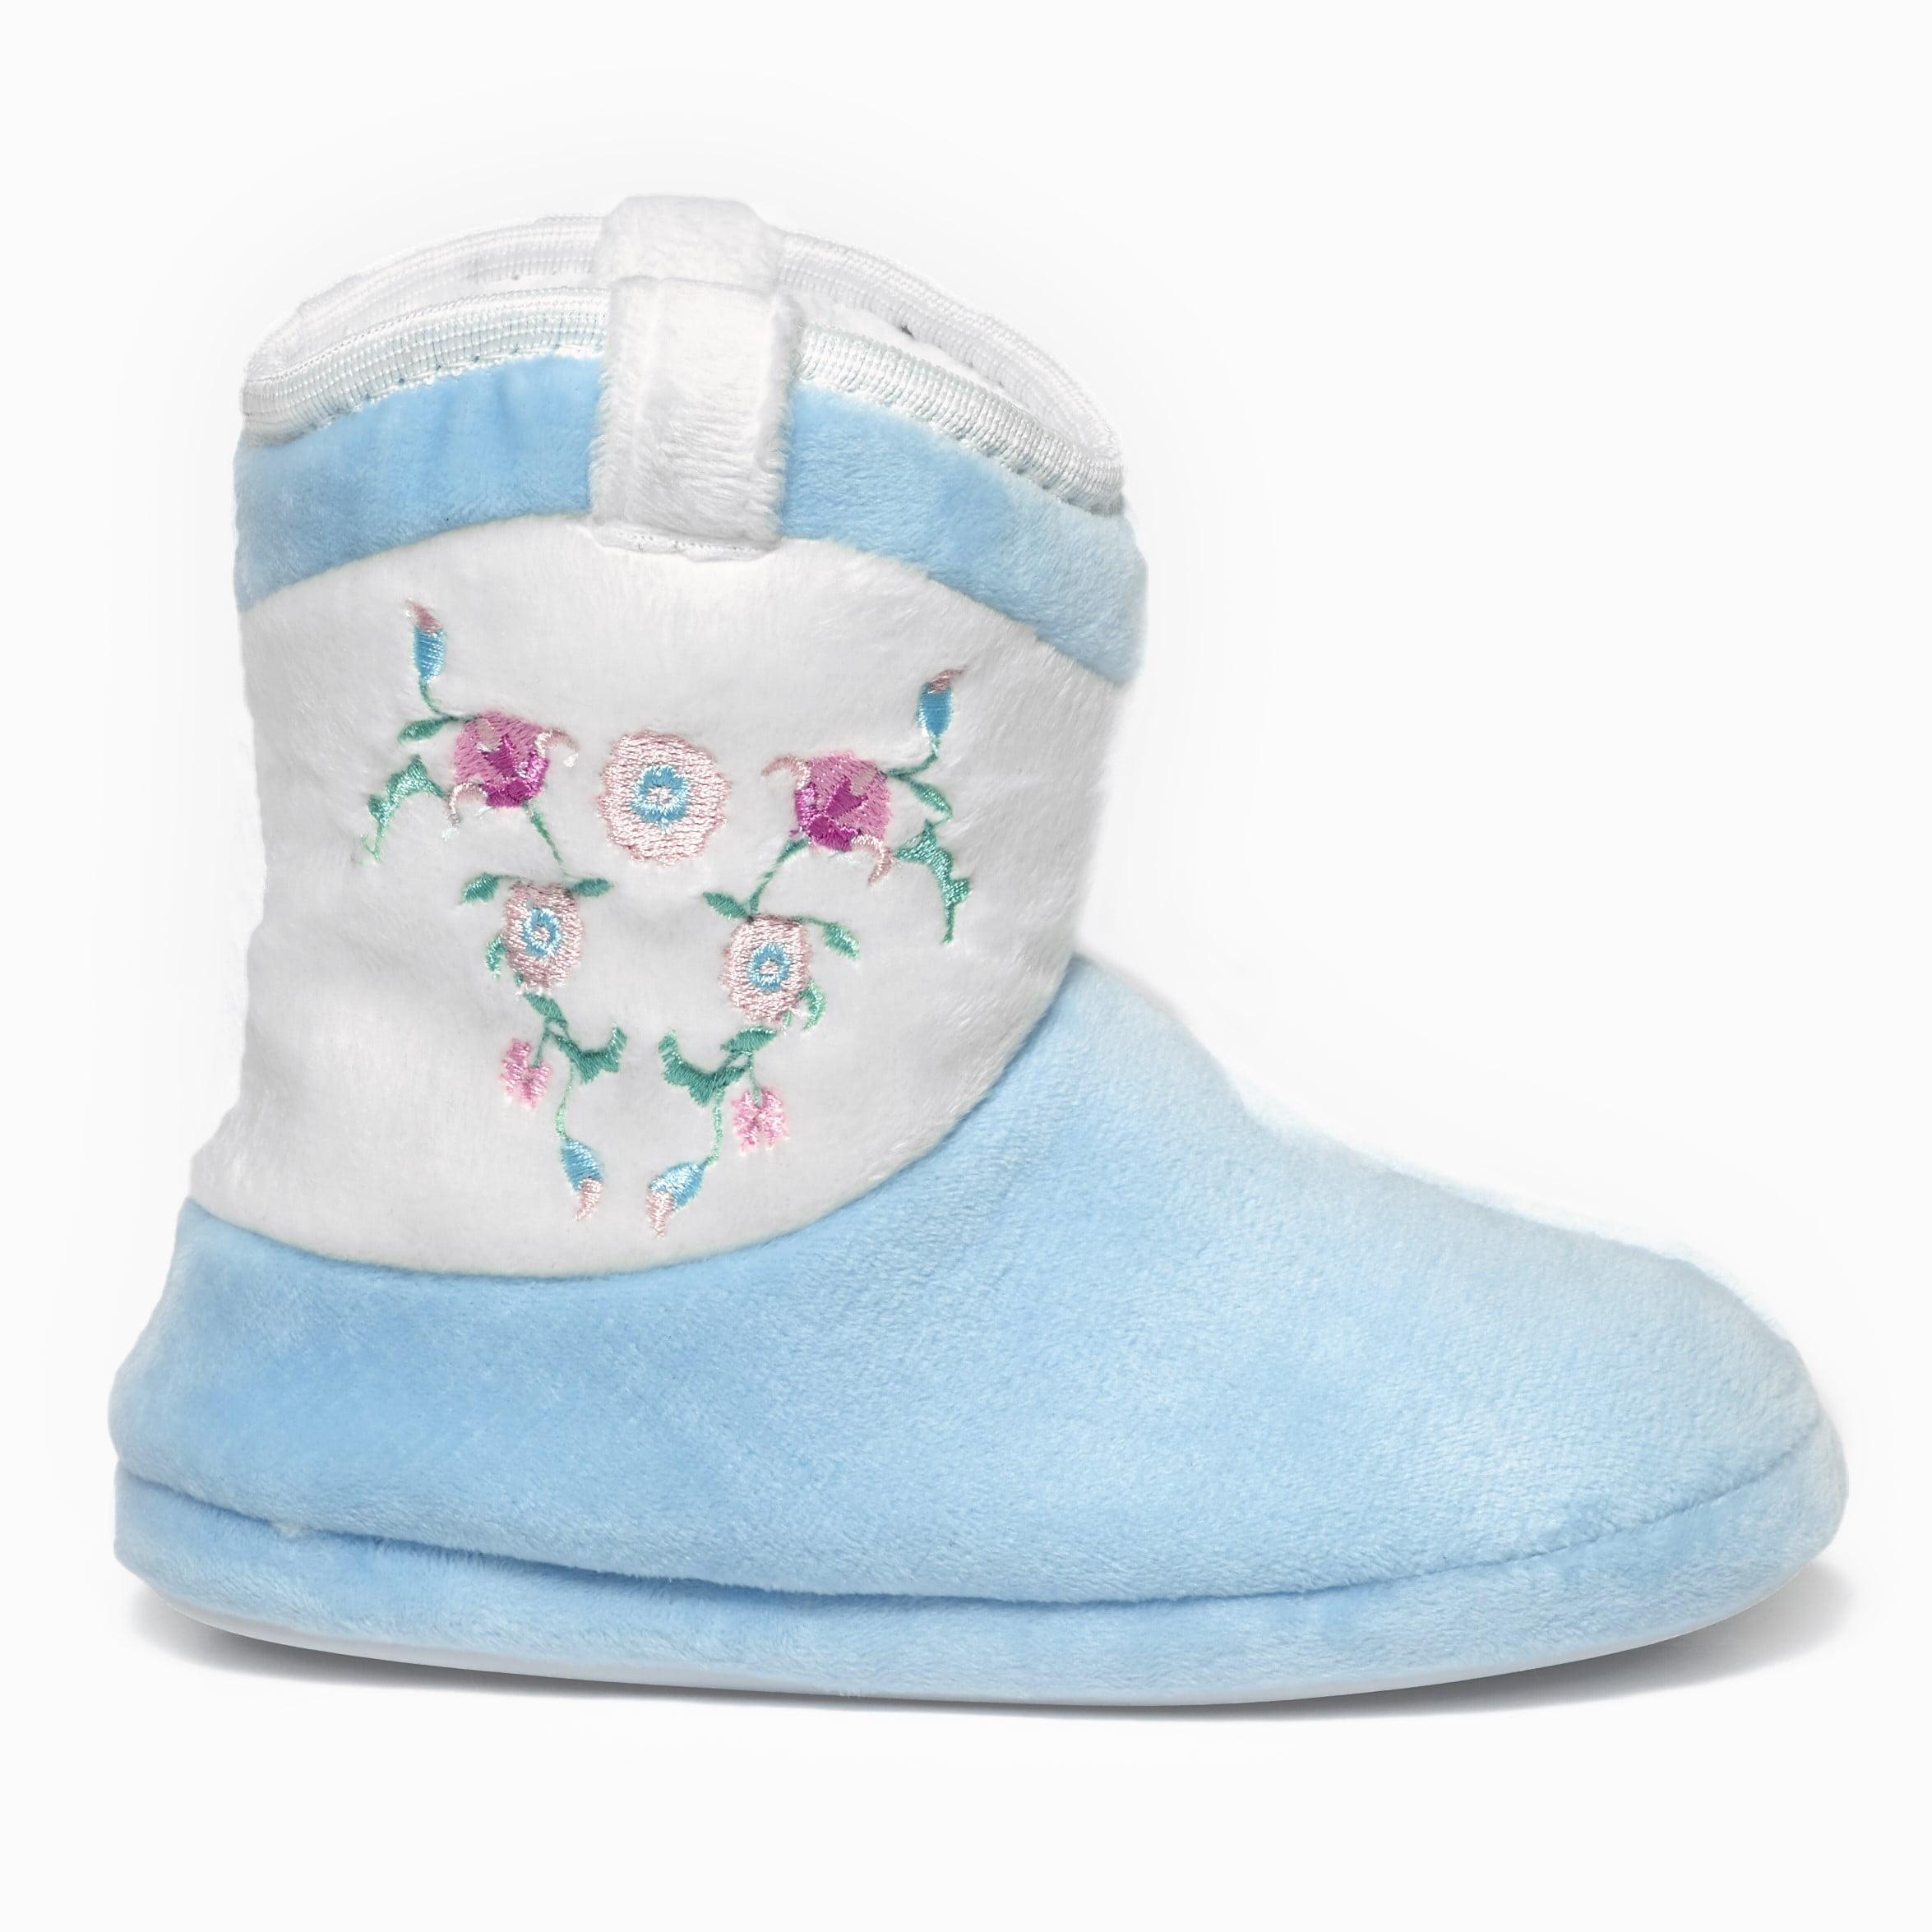 Western Cowgirl Slipper Boots - Walmart